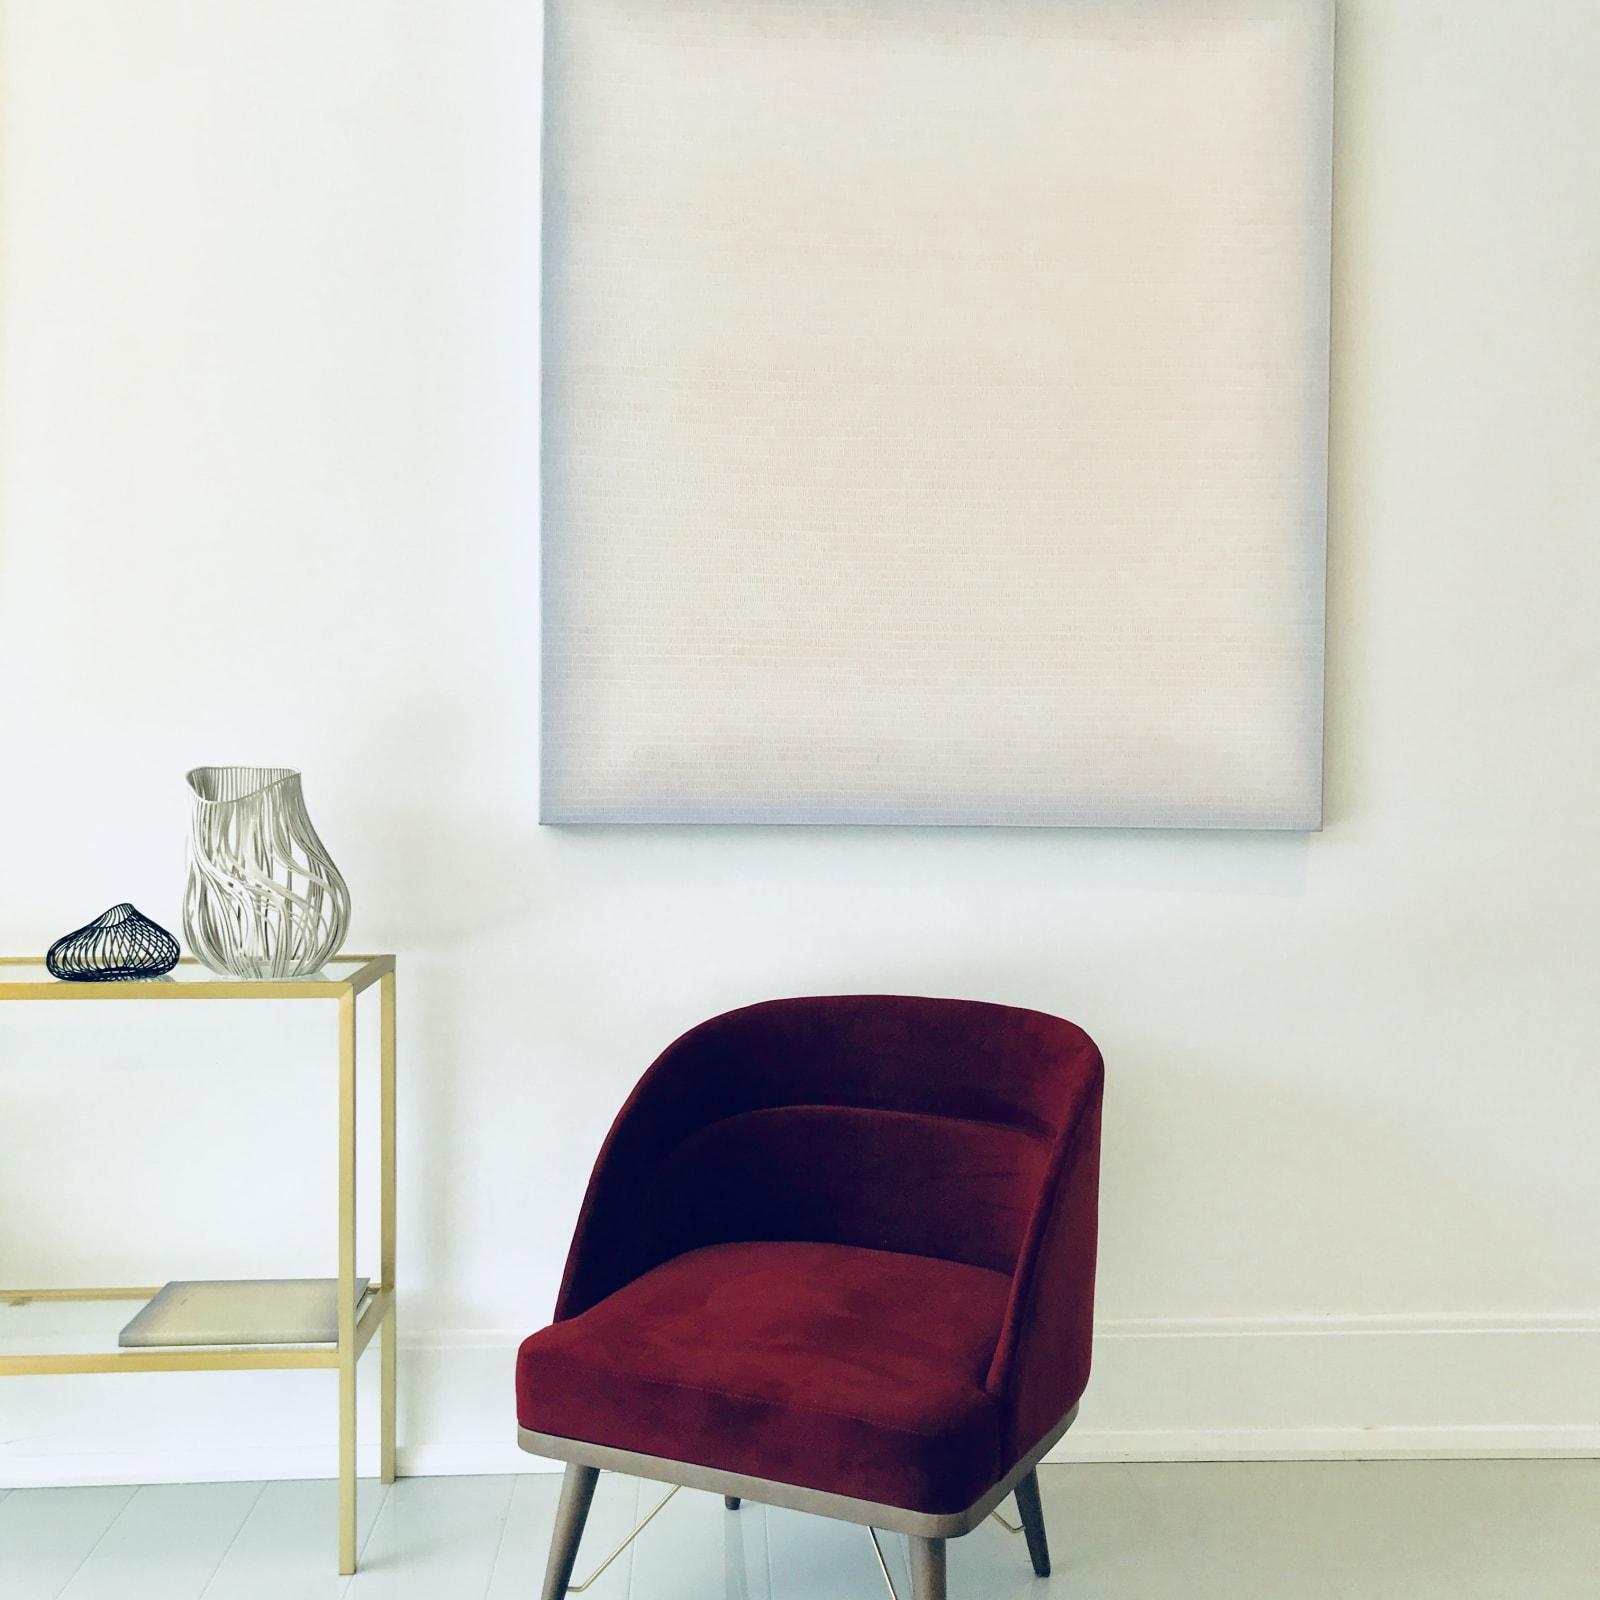 The Art of Interiors II